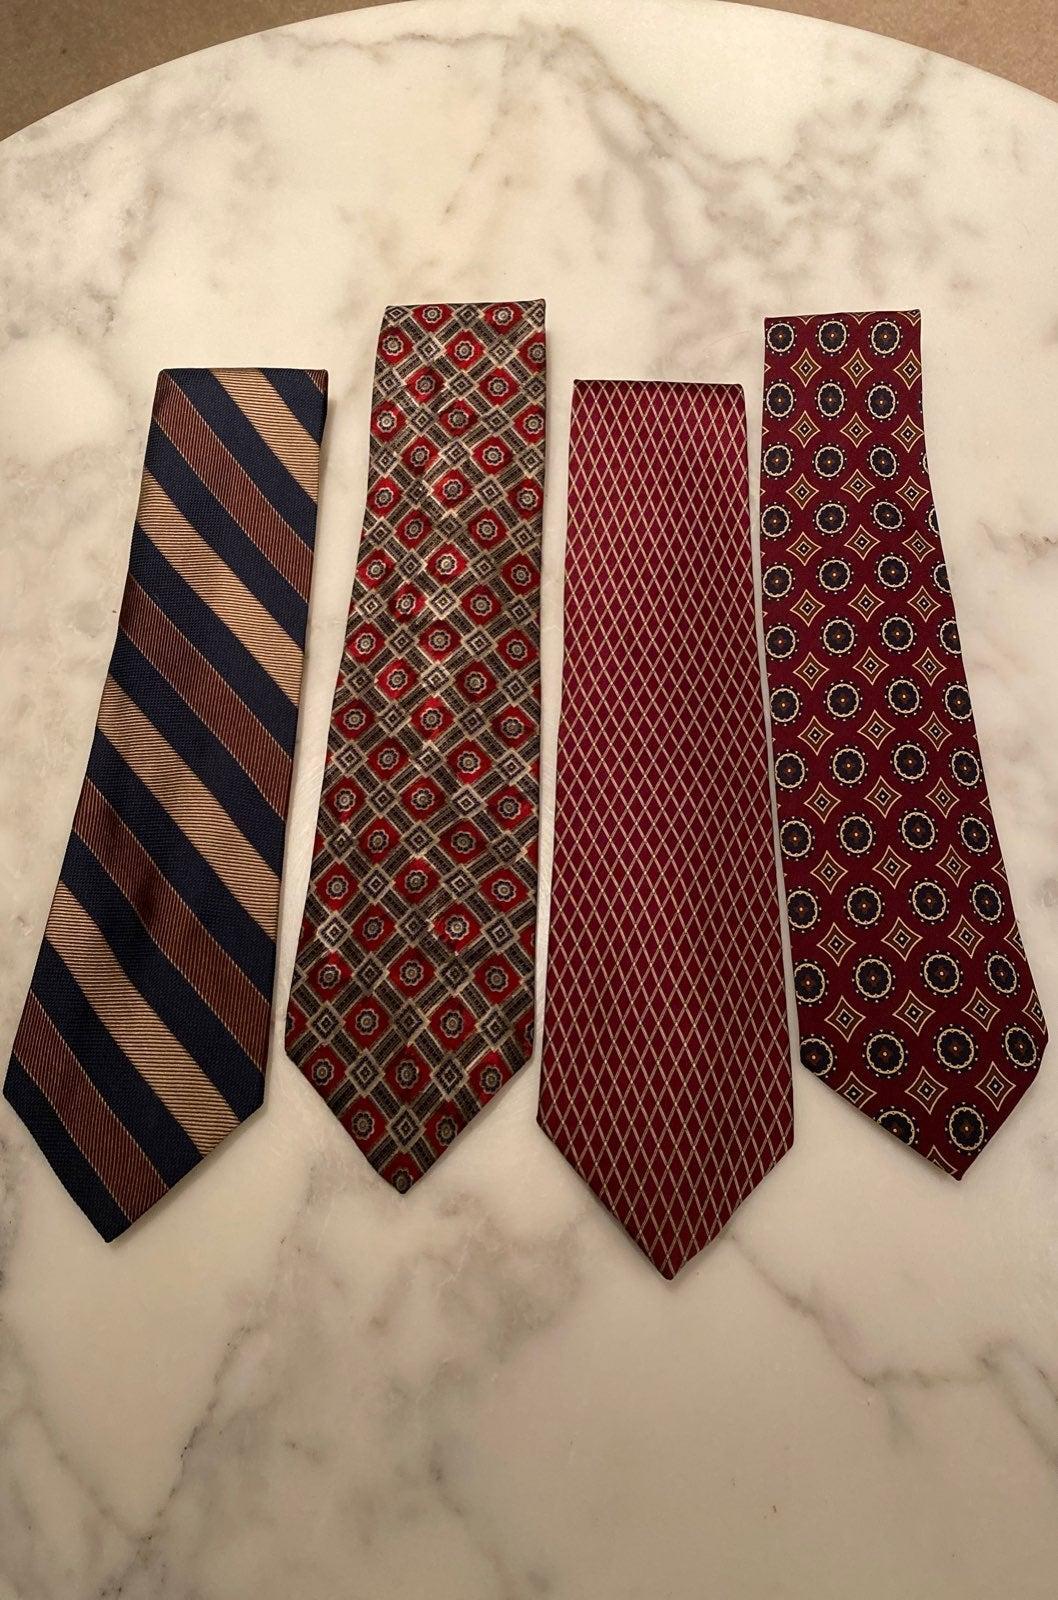 Roundtree & Yorke Silk Neckties